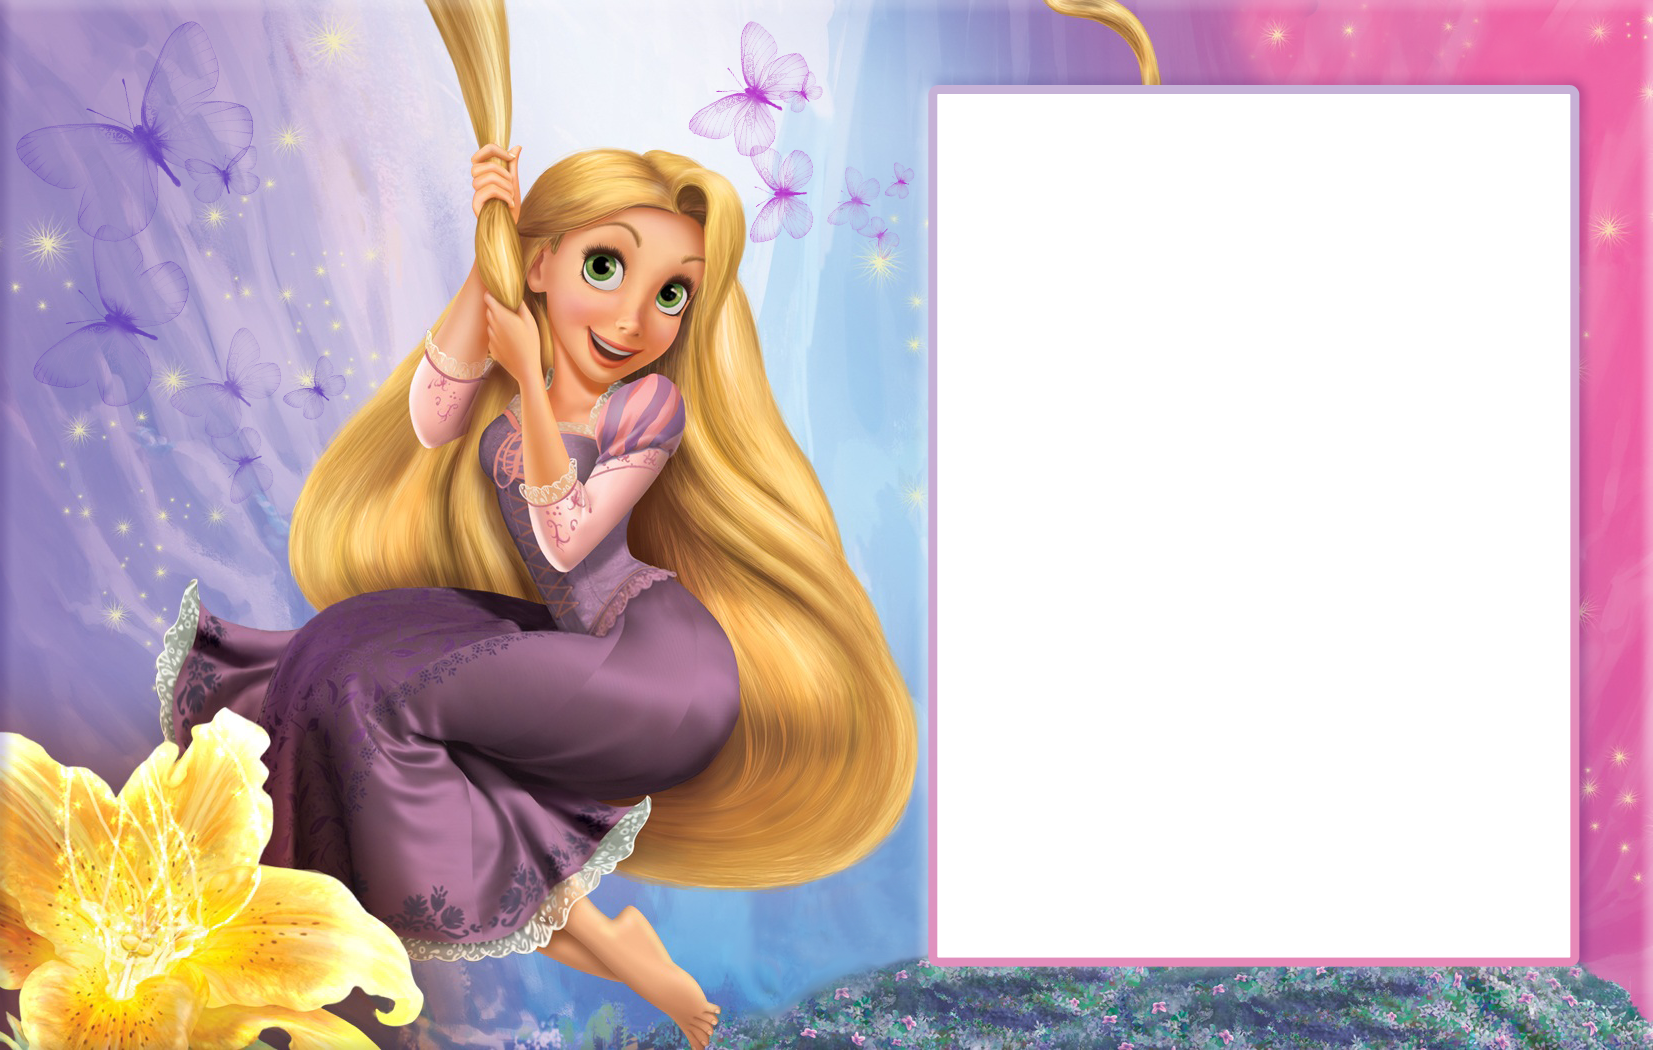 Rapunzel clipart transparent background. Child png frame gallery